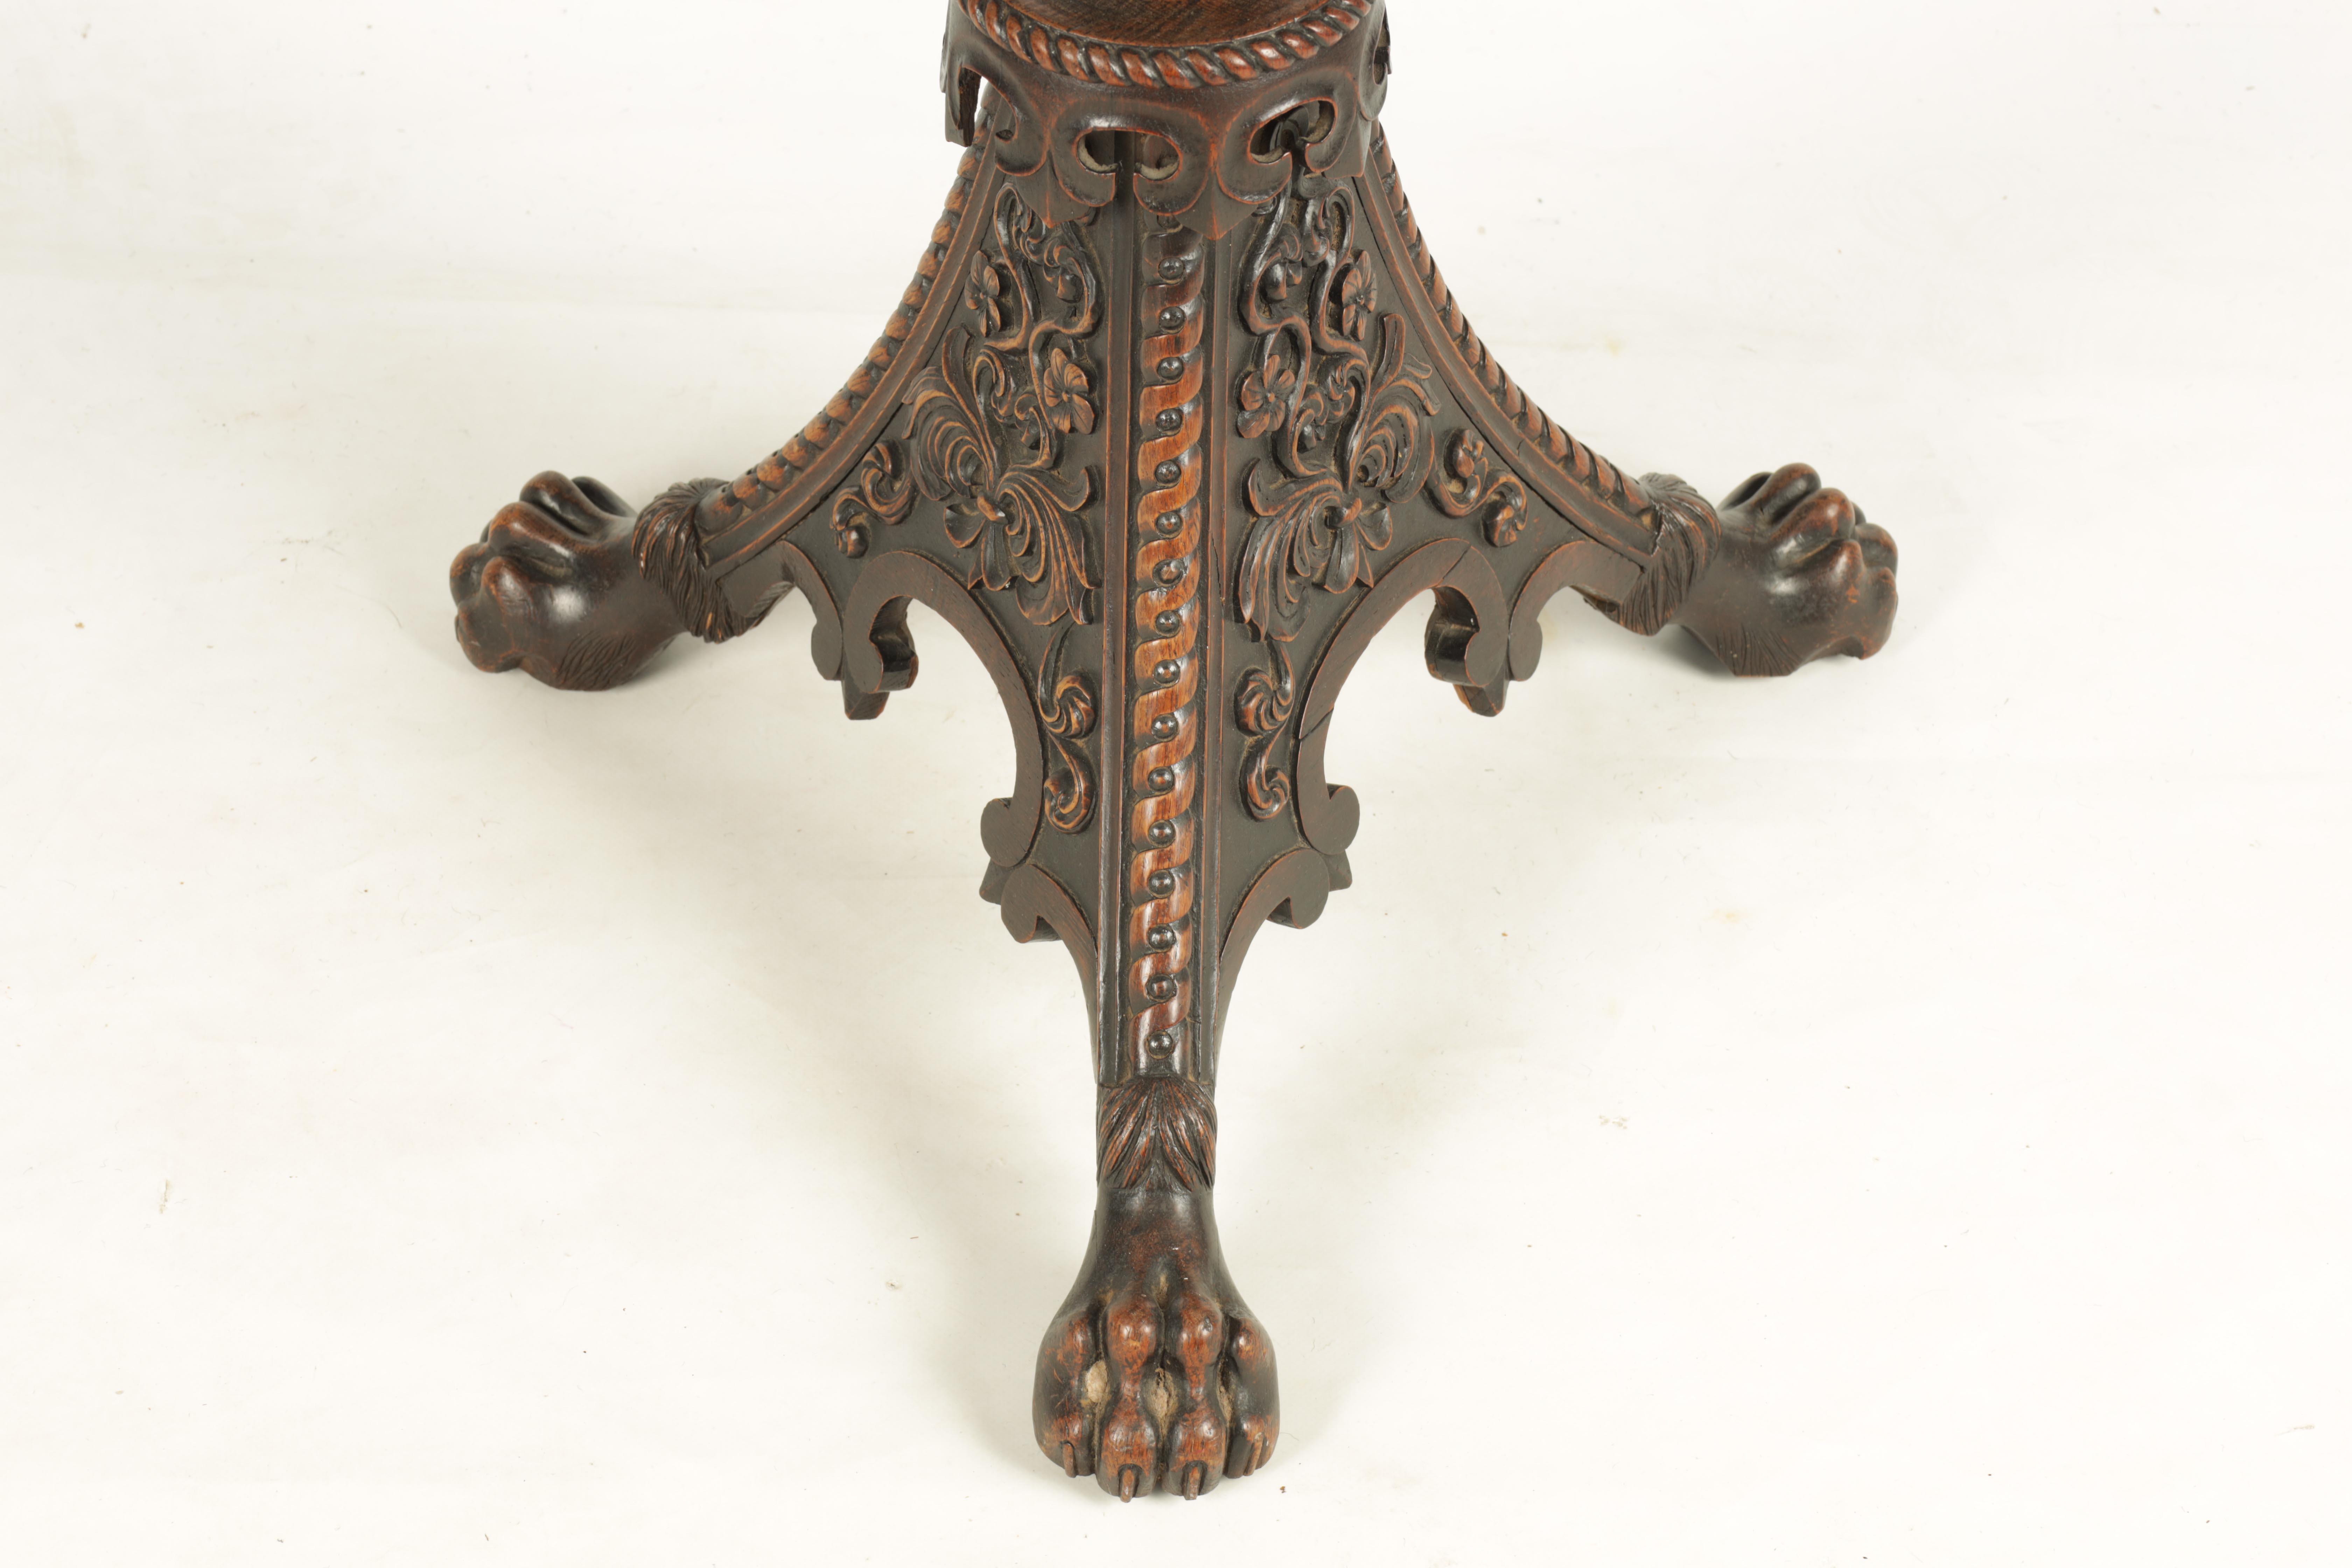 AN UNUSUAL 19TH CENTURY IRISH STYLE POLLARD OAK OCCASIONAL TABLE/ ADJUSTABLE FIRE SCREEN with oak - Image 3 of 8